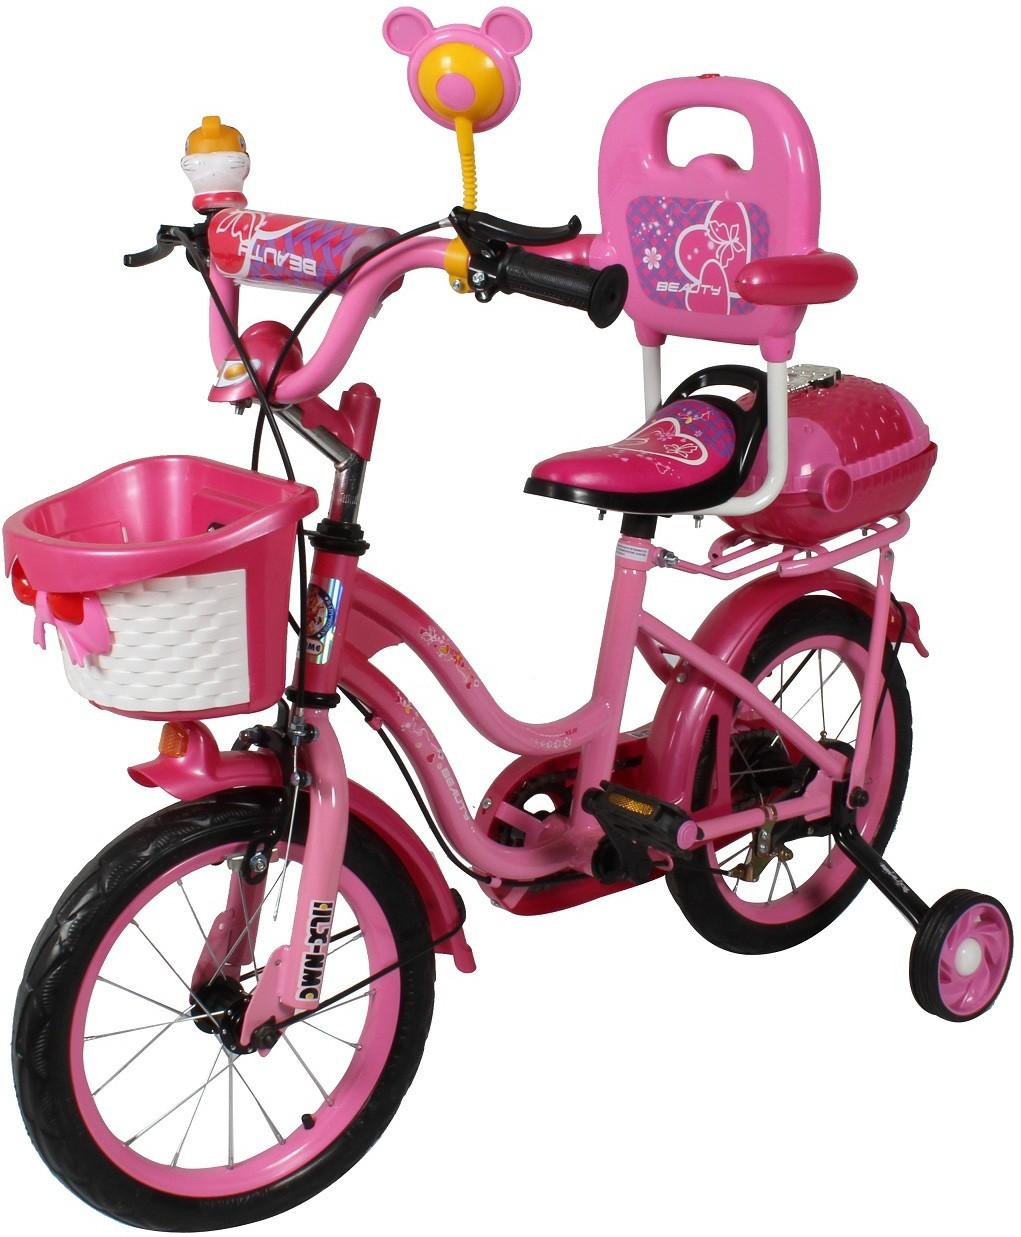 6b7a0371b84 HLX-NMC KIDS BICYCLE 14 BOWTIE DARK PINK 14BOWTIEDPK Recreation Cycle